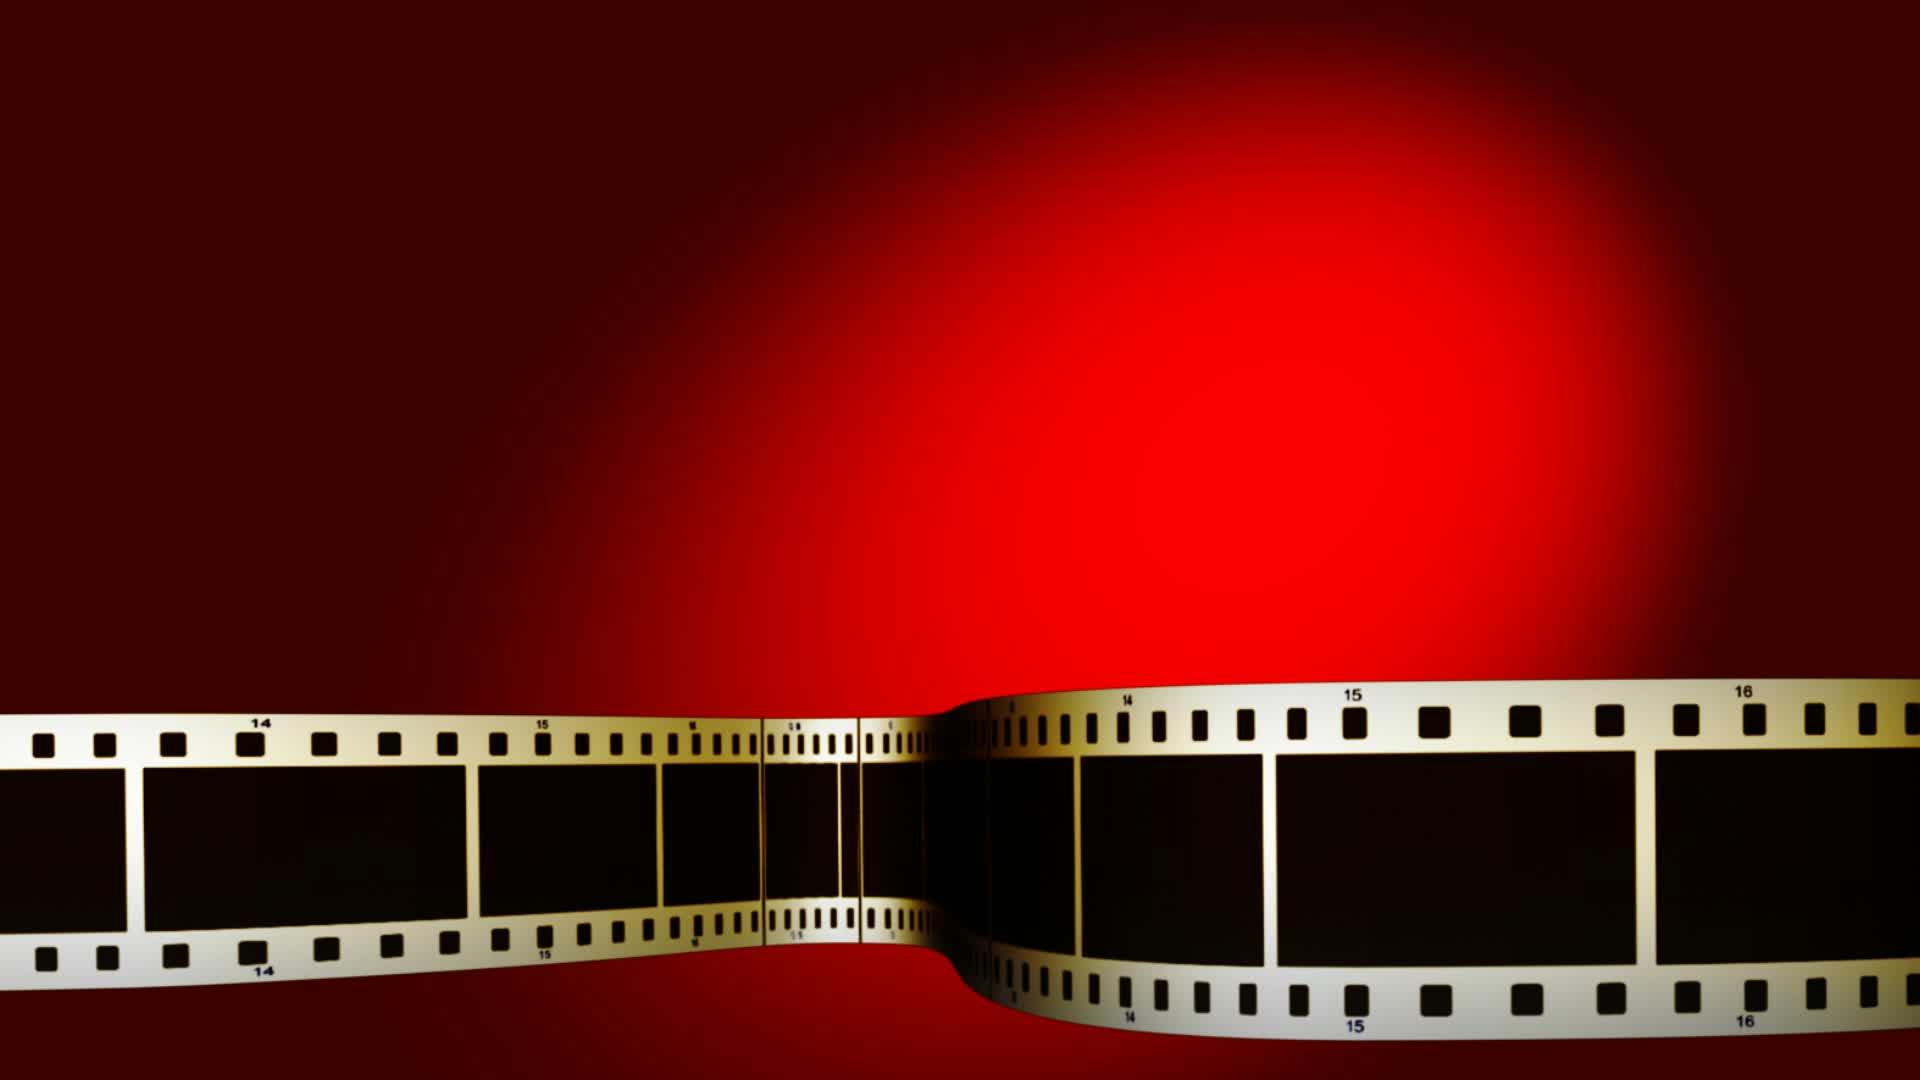 Film Strip Wallpaper 1920x1080